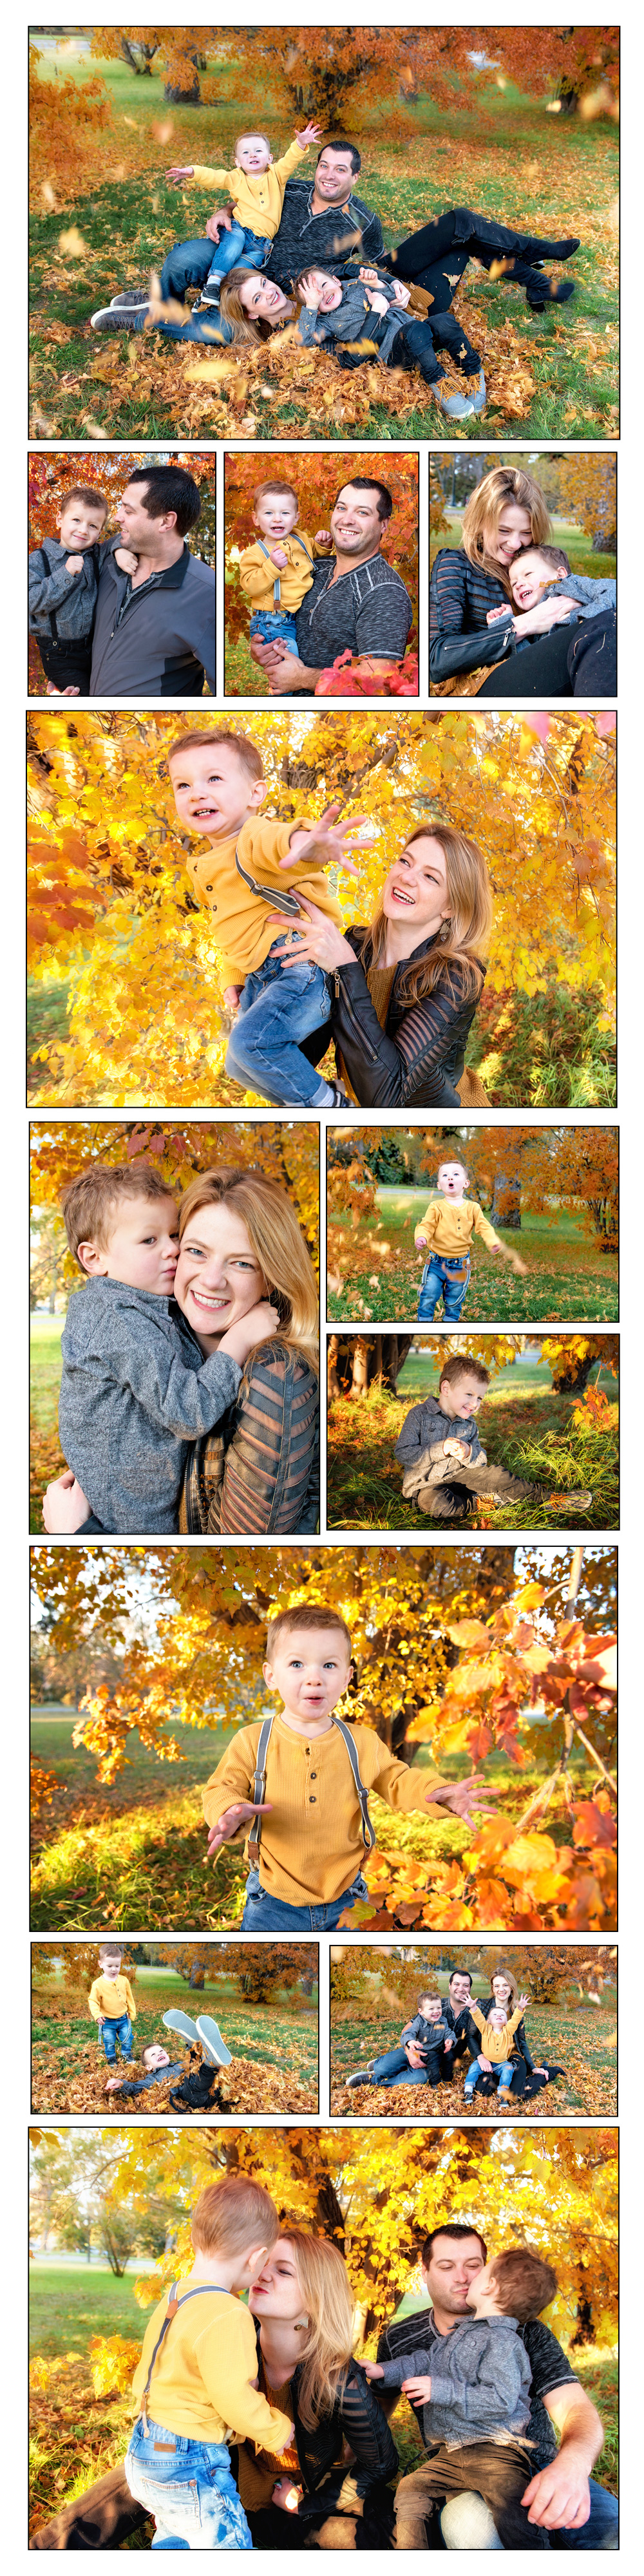 magical-fall-family-photos-free-lense-photo.jpg